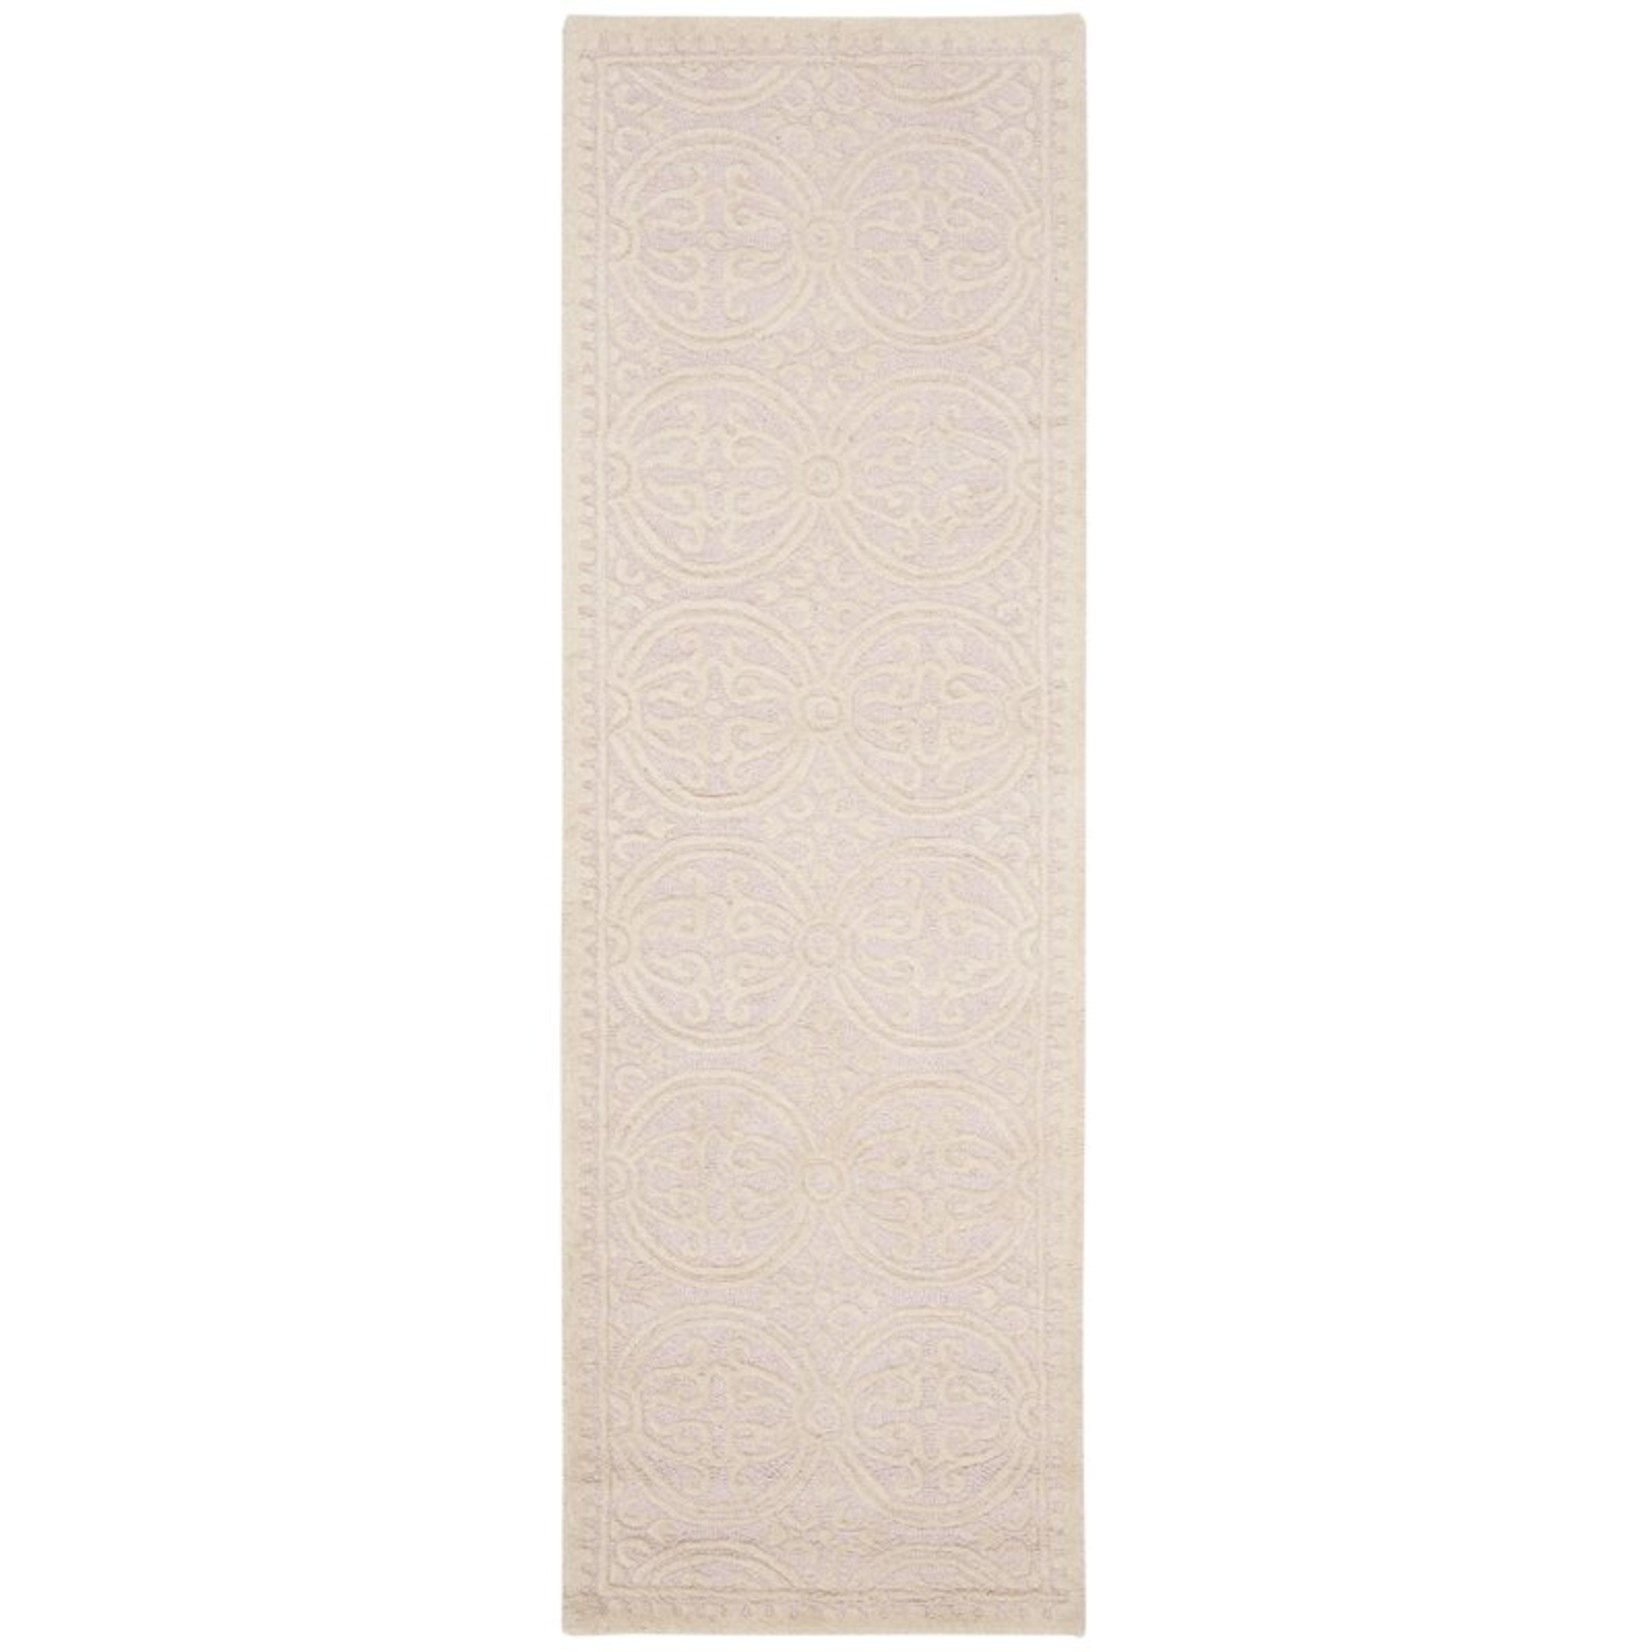 "*2'6"" x 6' - Brunswick Geometric Handmade Wool Light Pink/Ivory Runner"